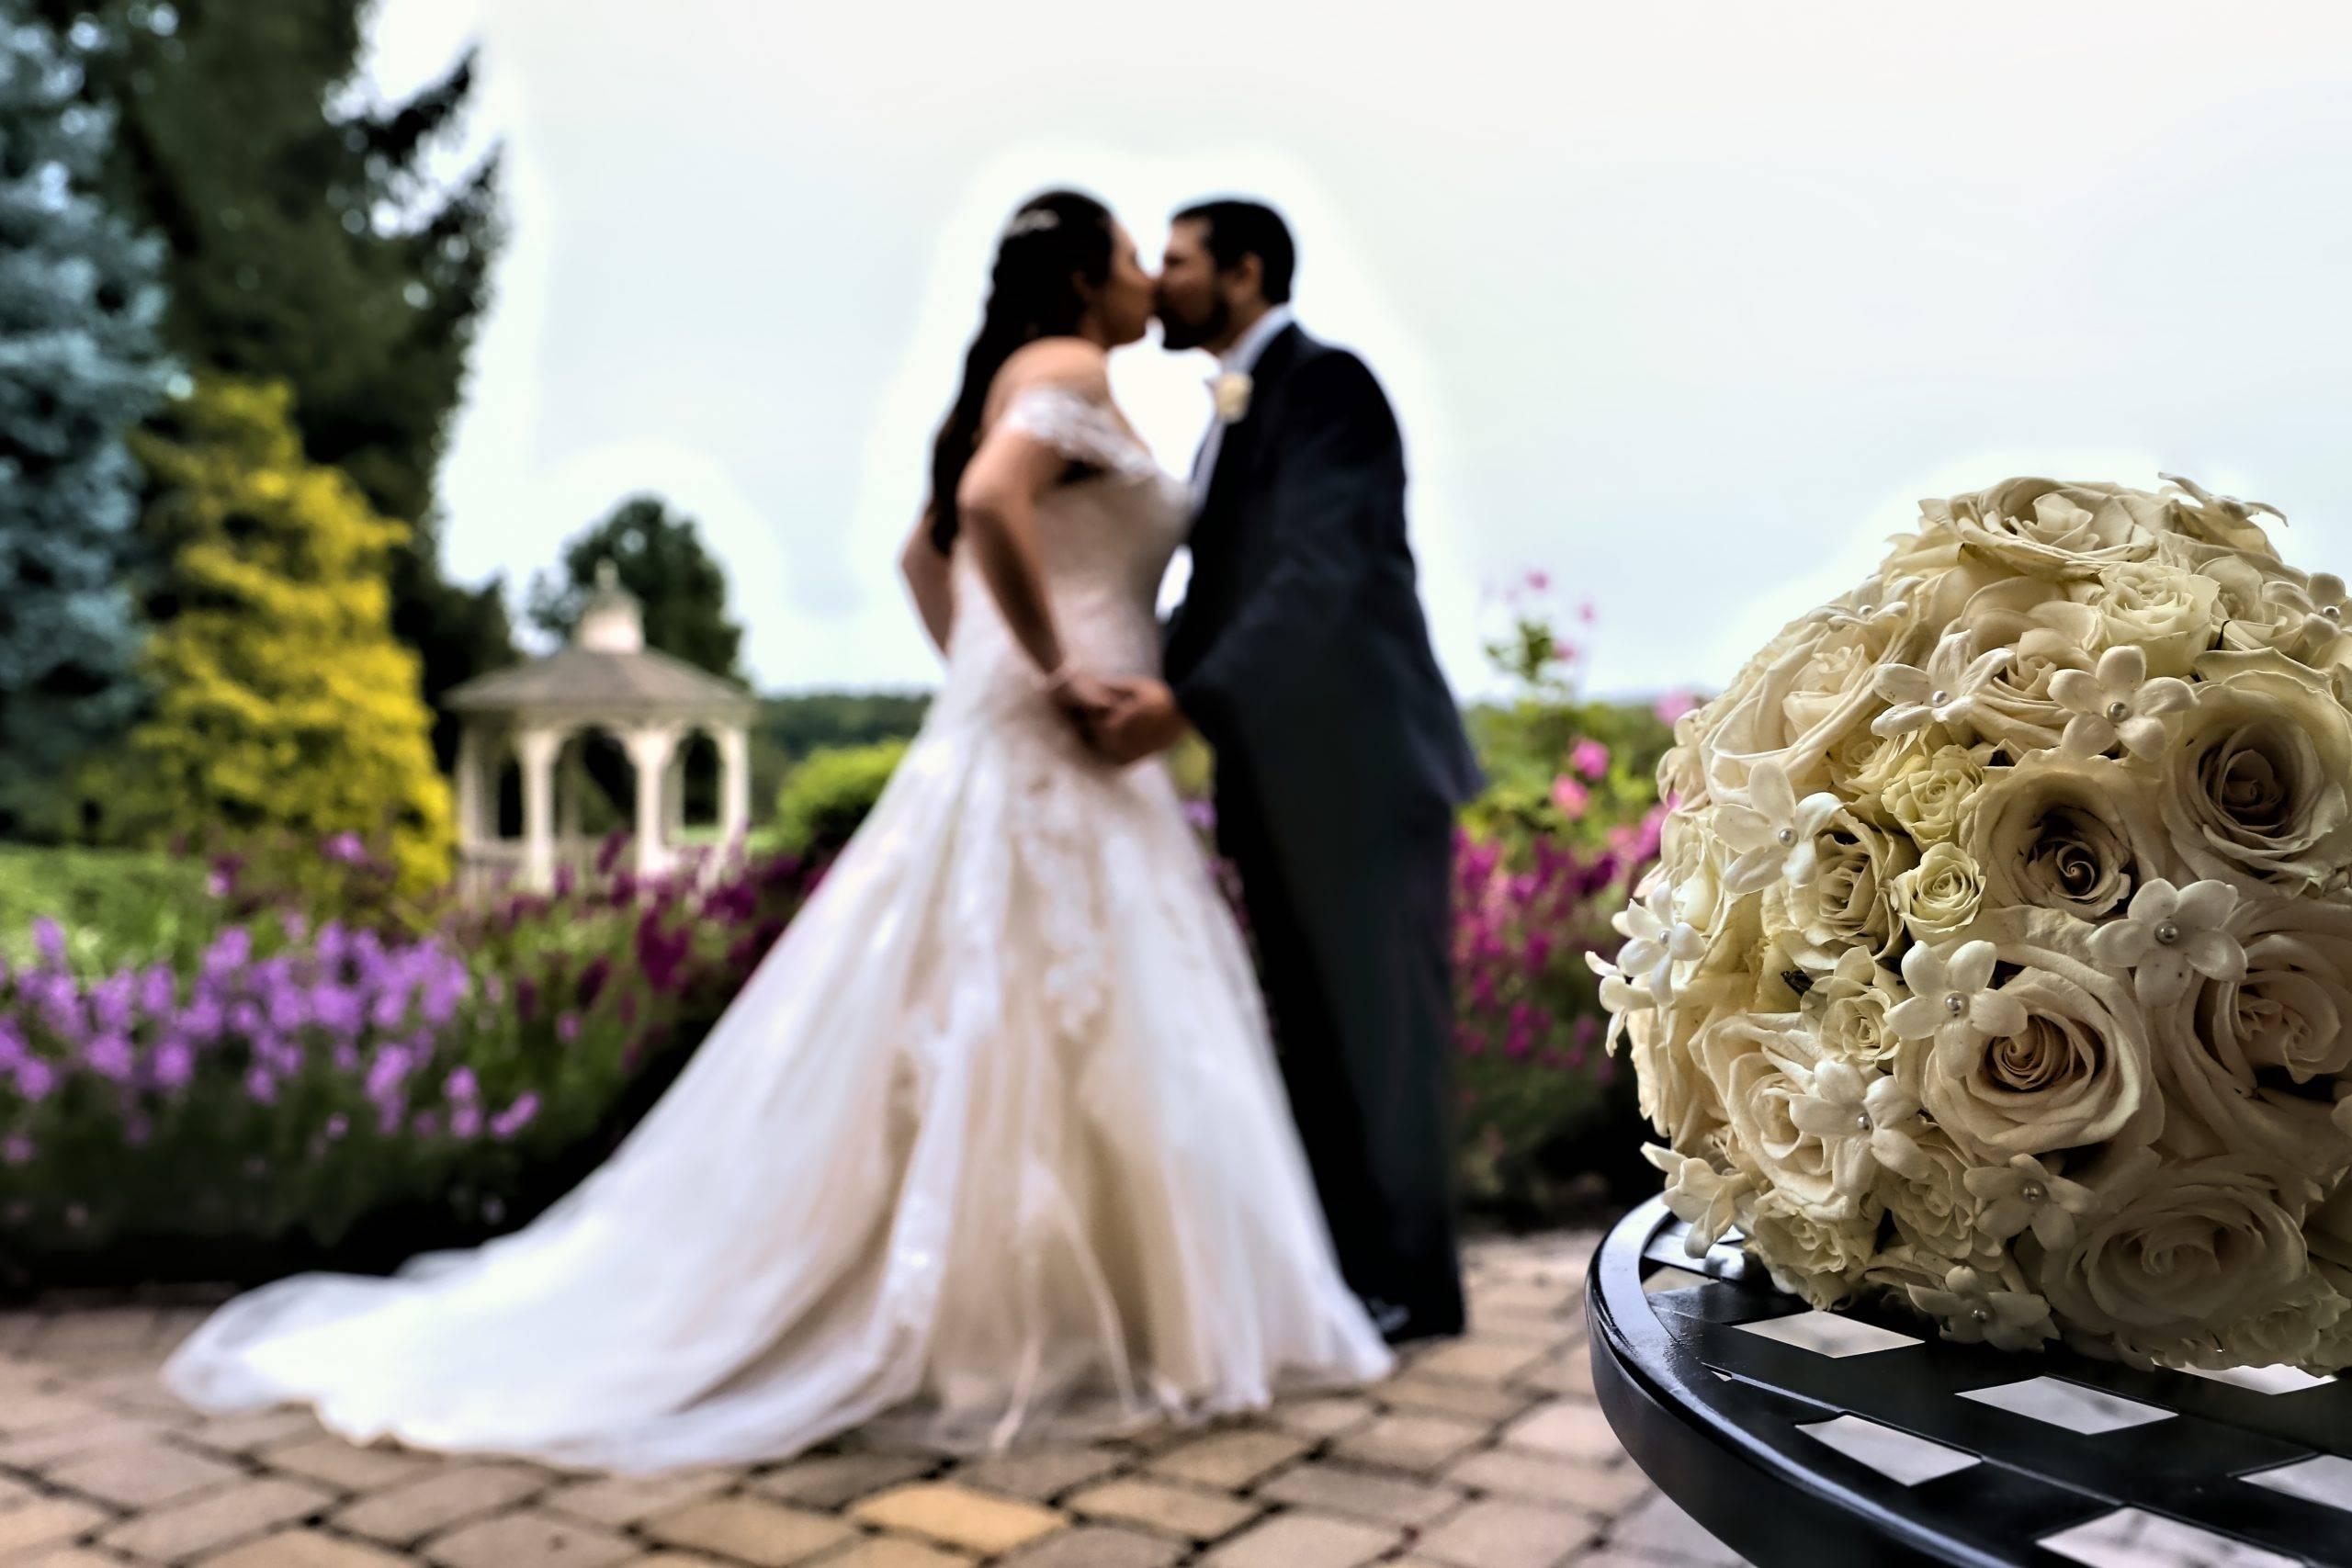 Basking Ridge CC bride and groom on patio